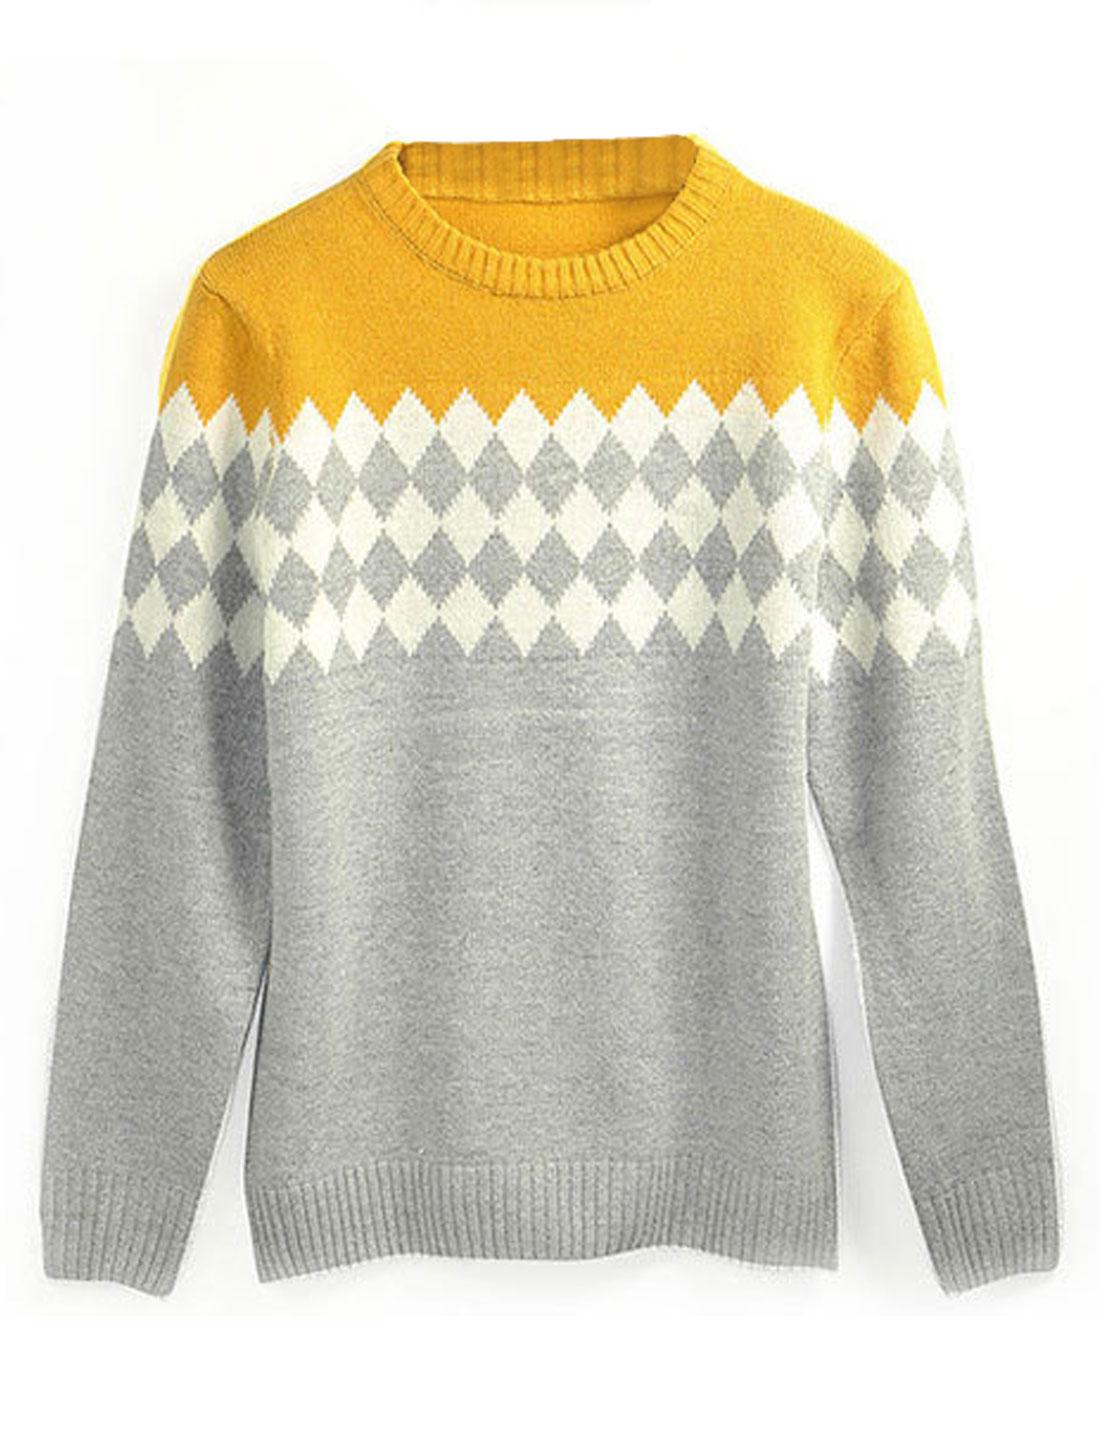 Men Leisure Crew Neck Contrast Color Argyle Print Sweater Light Gray M